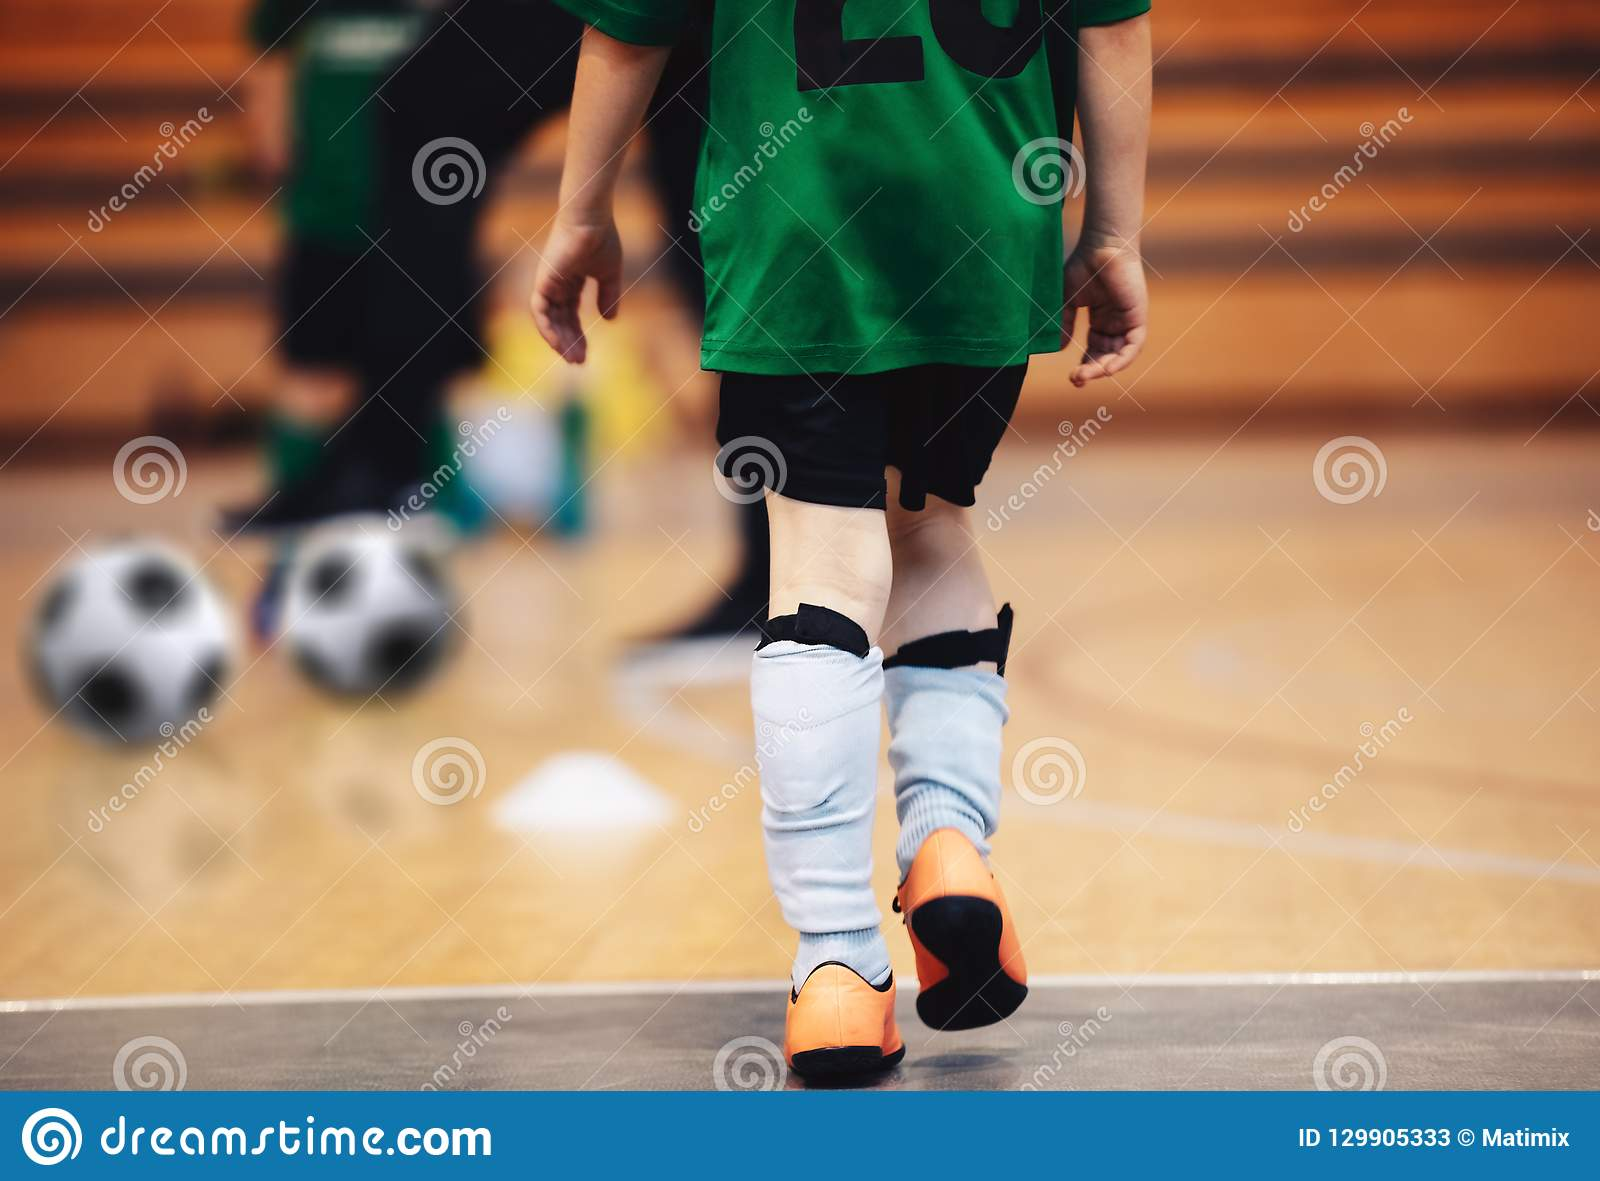 Kids futsal training. Indoor soccer players training with balls.